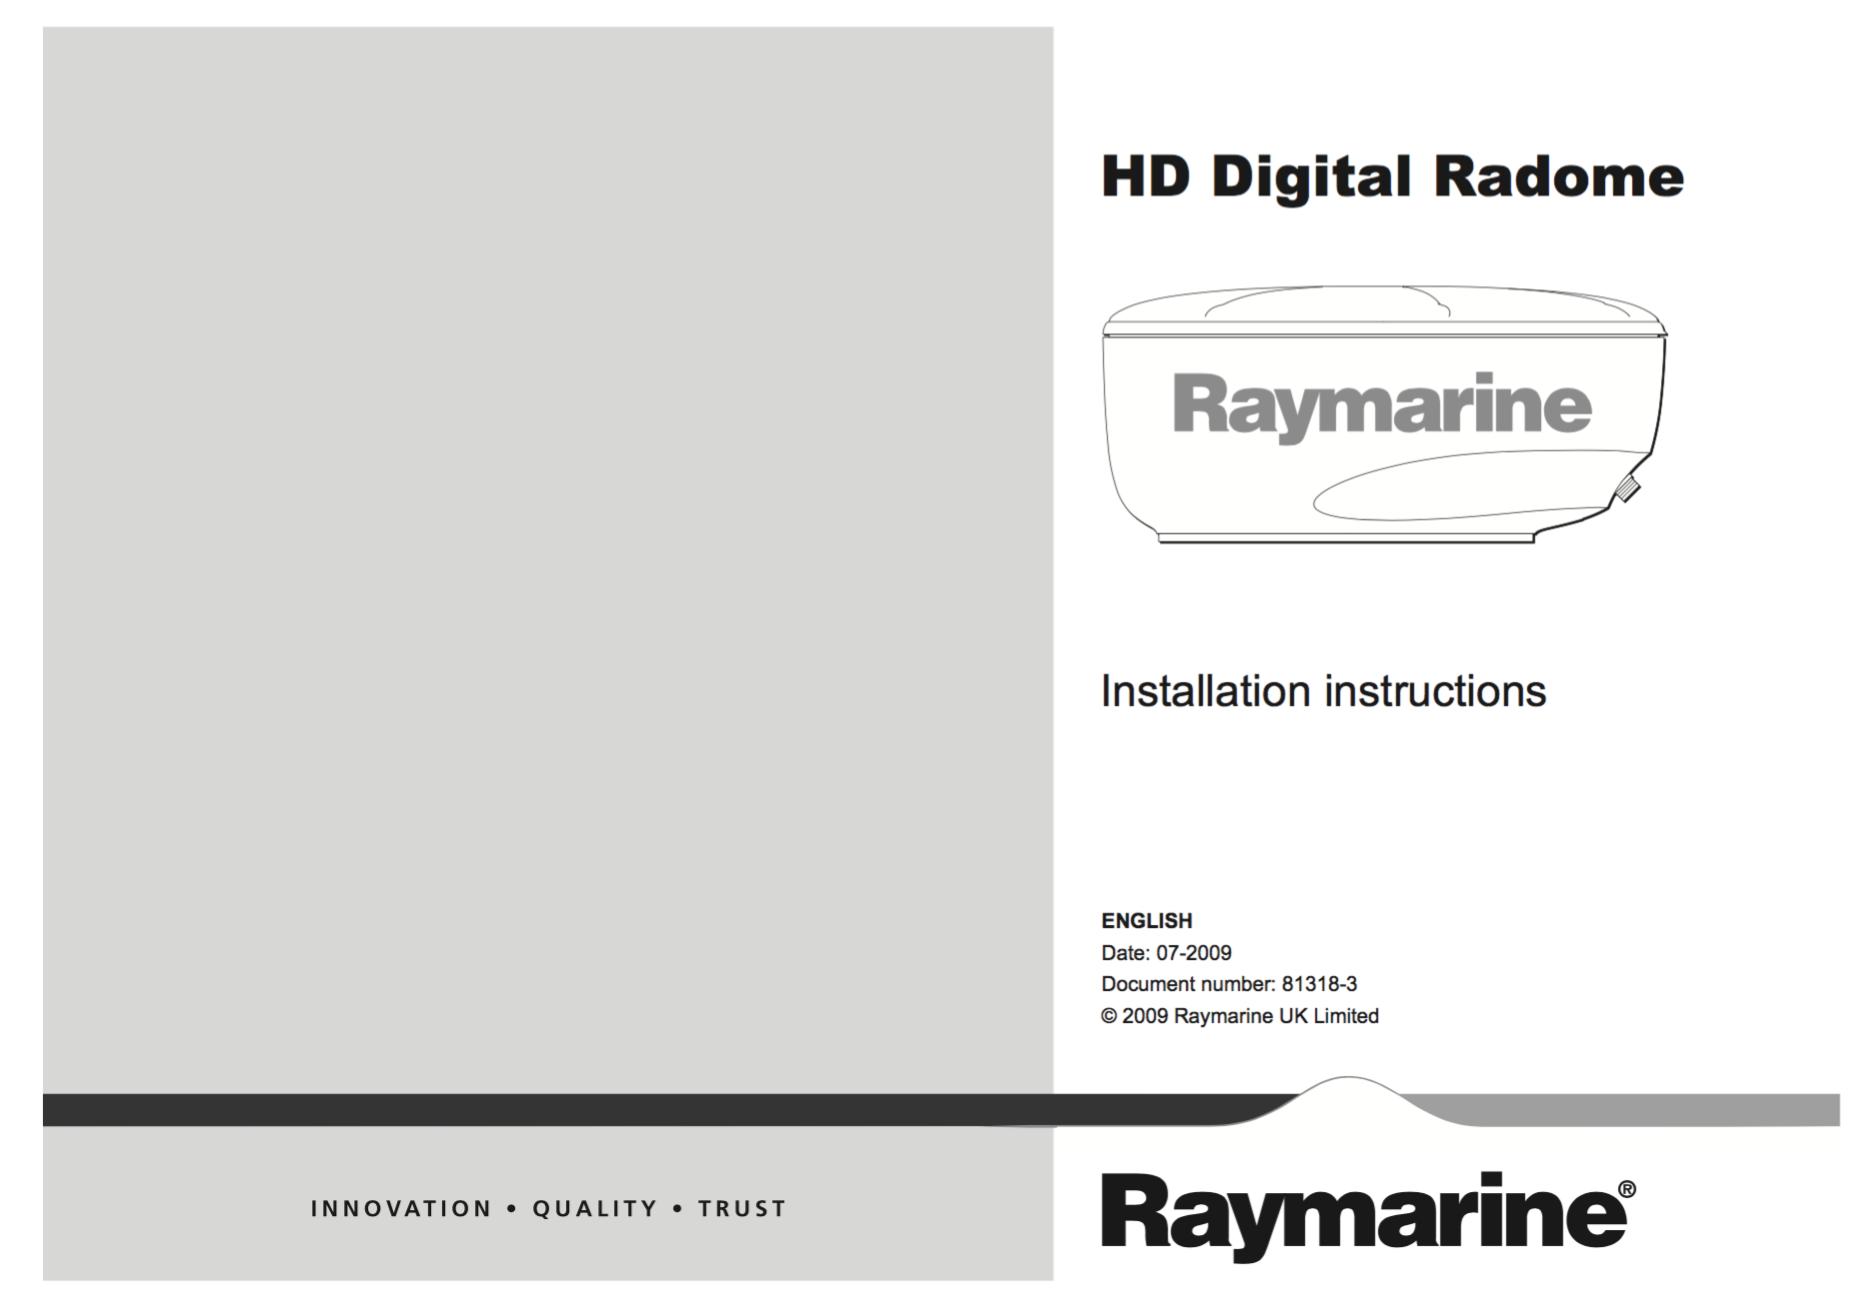 hd digital radome installation instructions